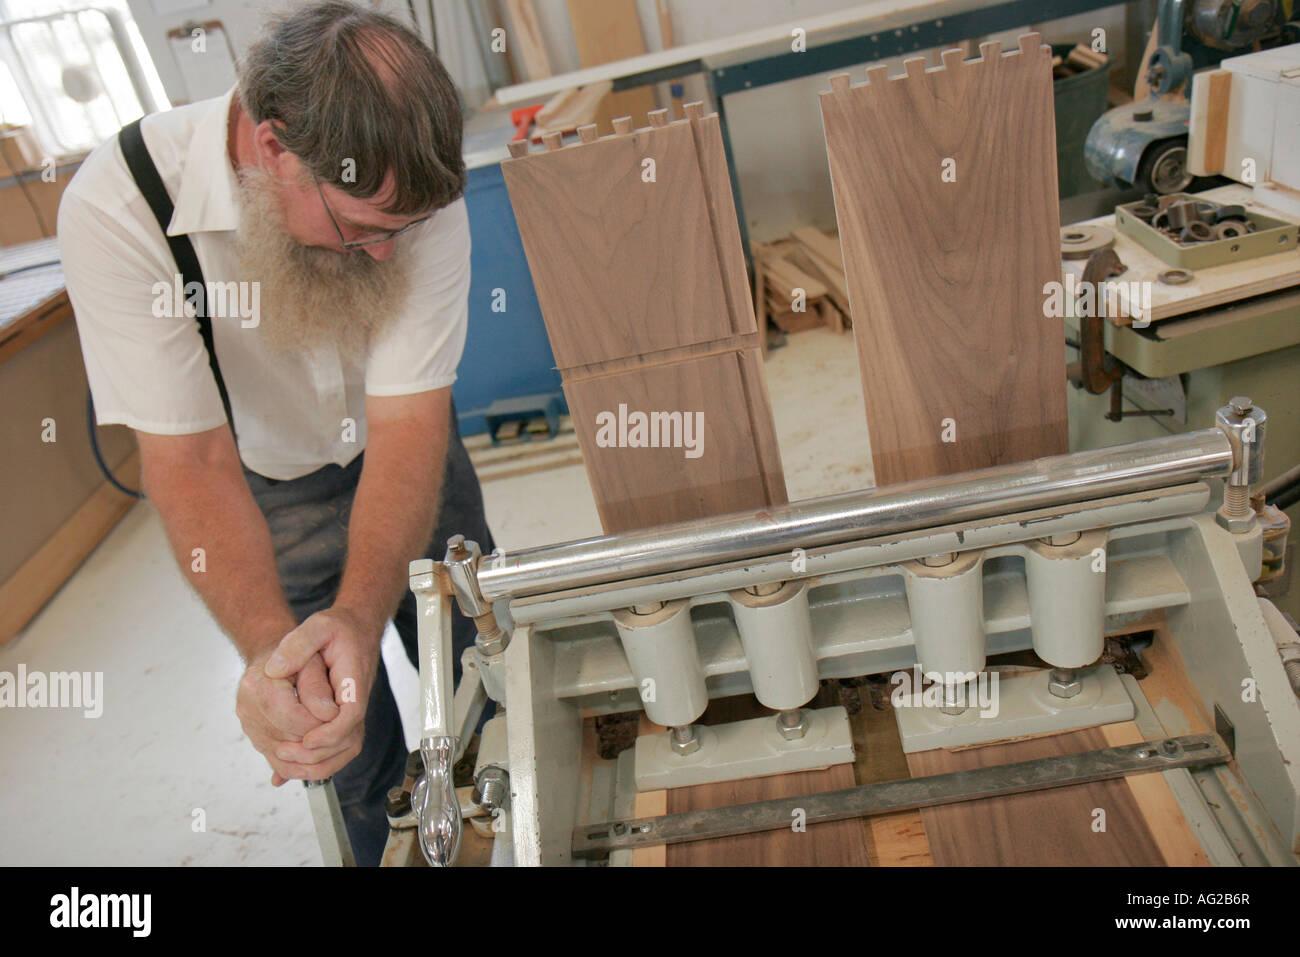 Indiana Shipshewana Topeka Lambright Woodworking Custom Built Furniture  Amish Furniture Maker